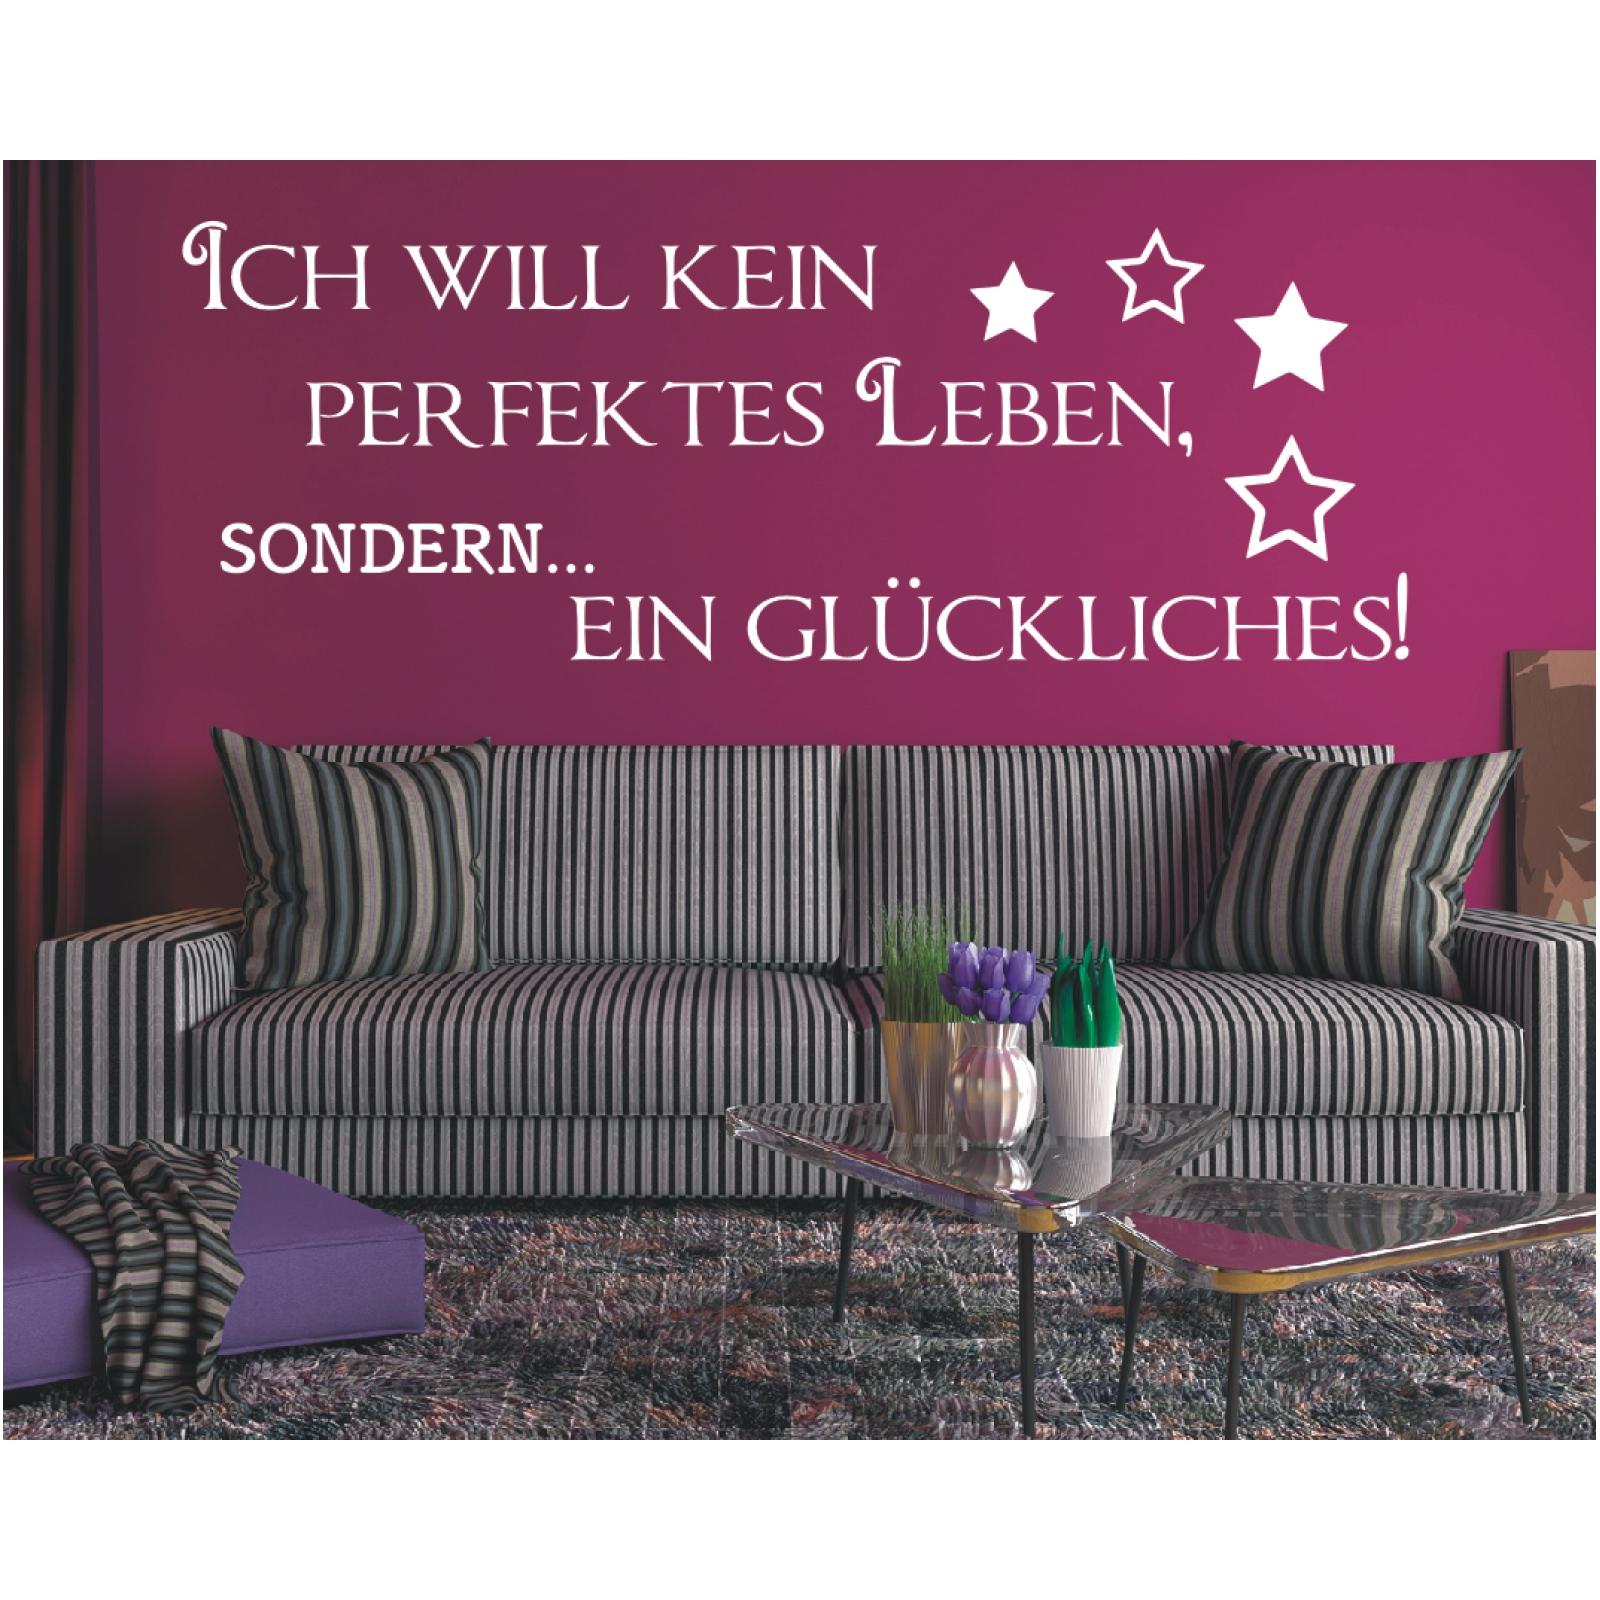 Wall Decals Stickers Spruch Wandtattoo Perfektes Leben Glucklich Wandsticker Wandaufkleber Sticker 5 Home Furniture Diy Morisonmauritius Com